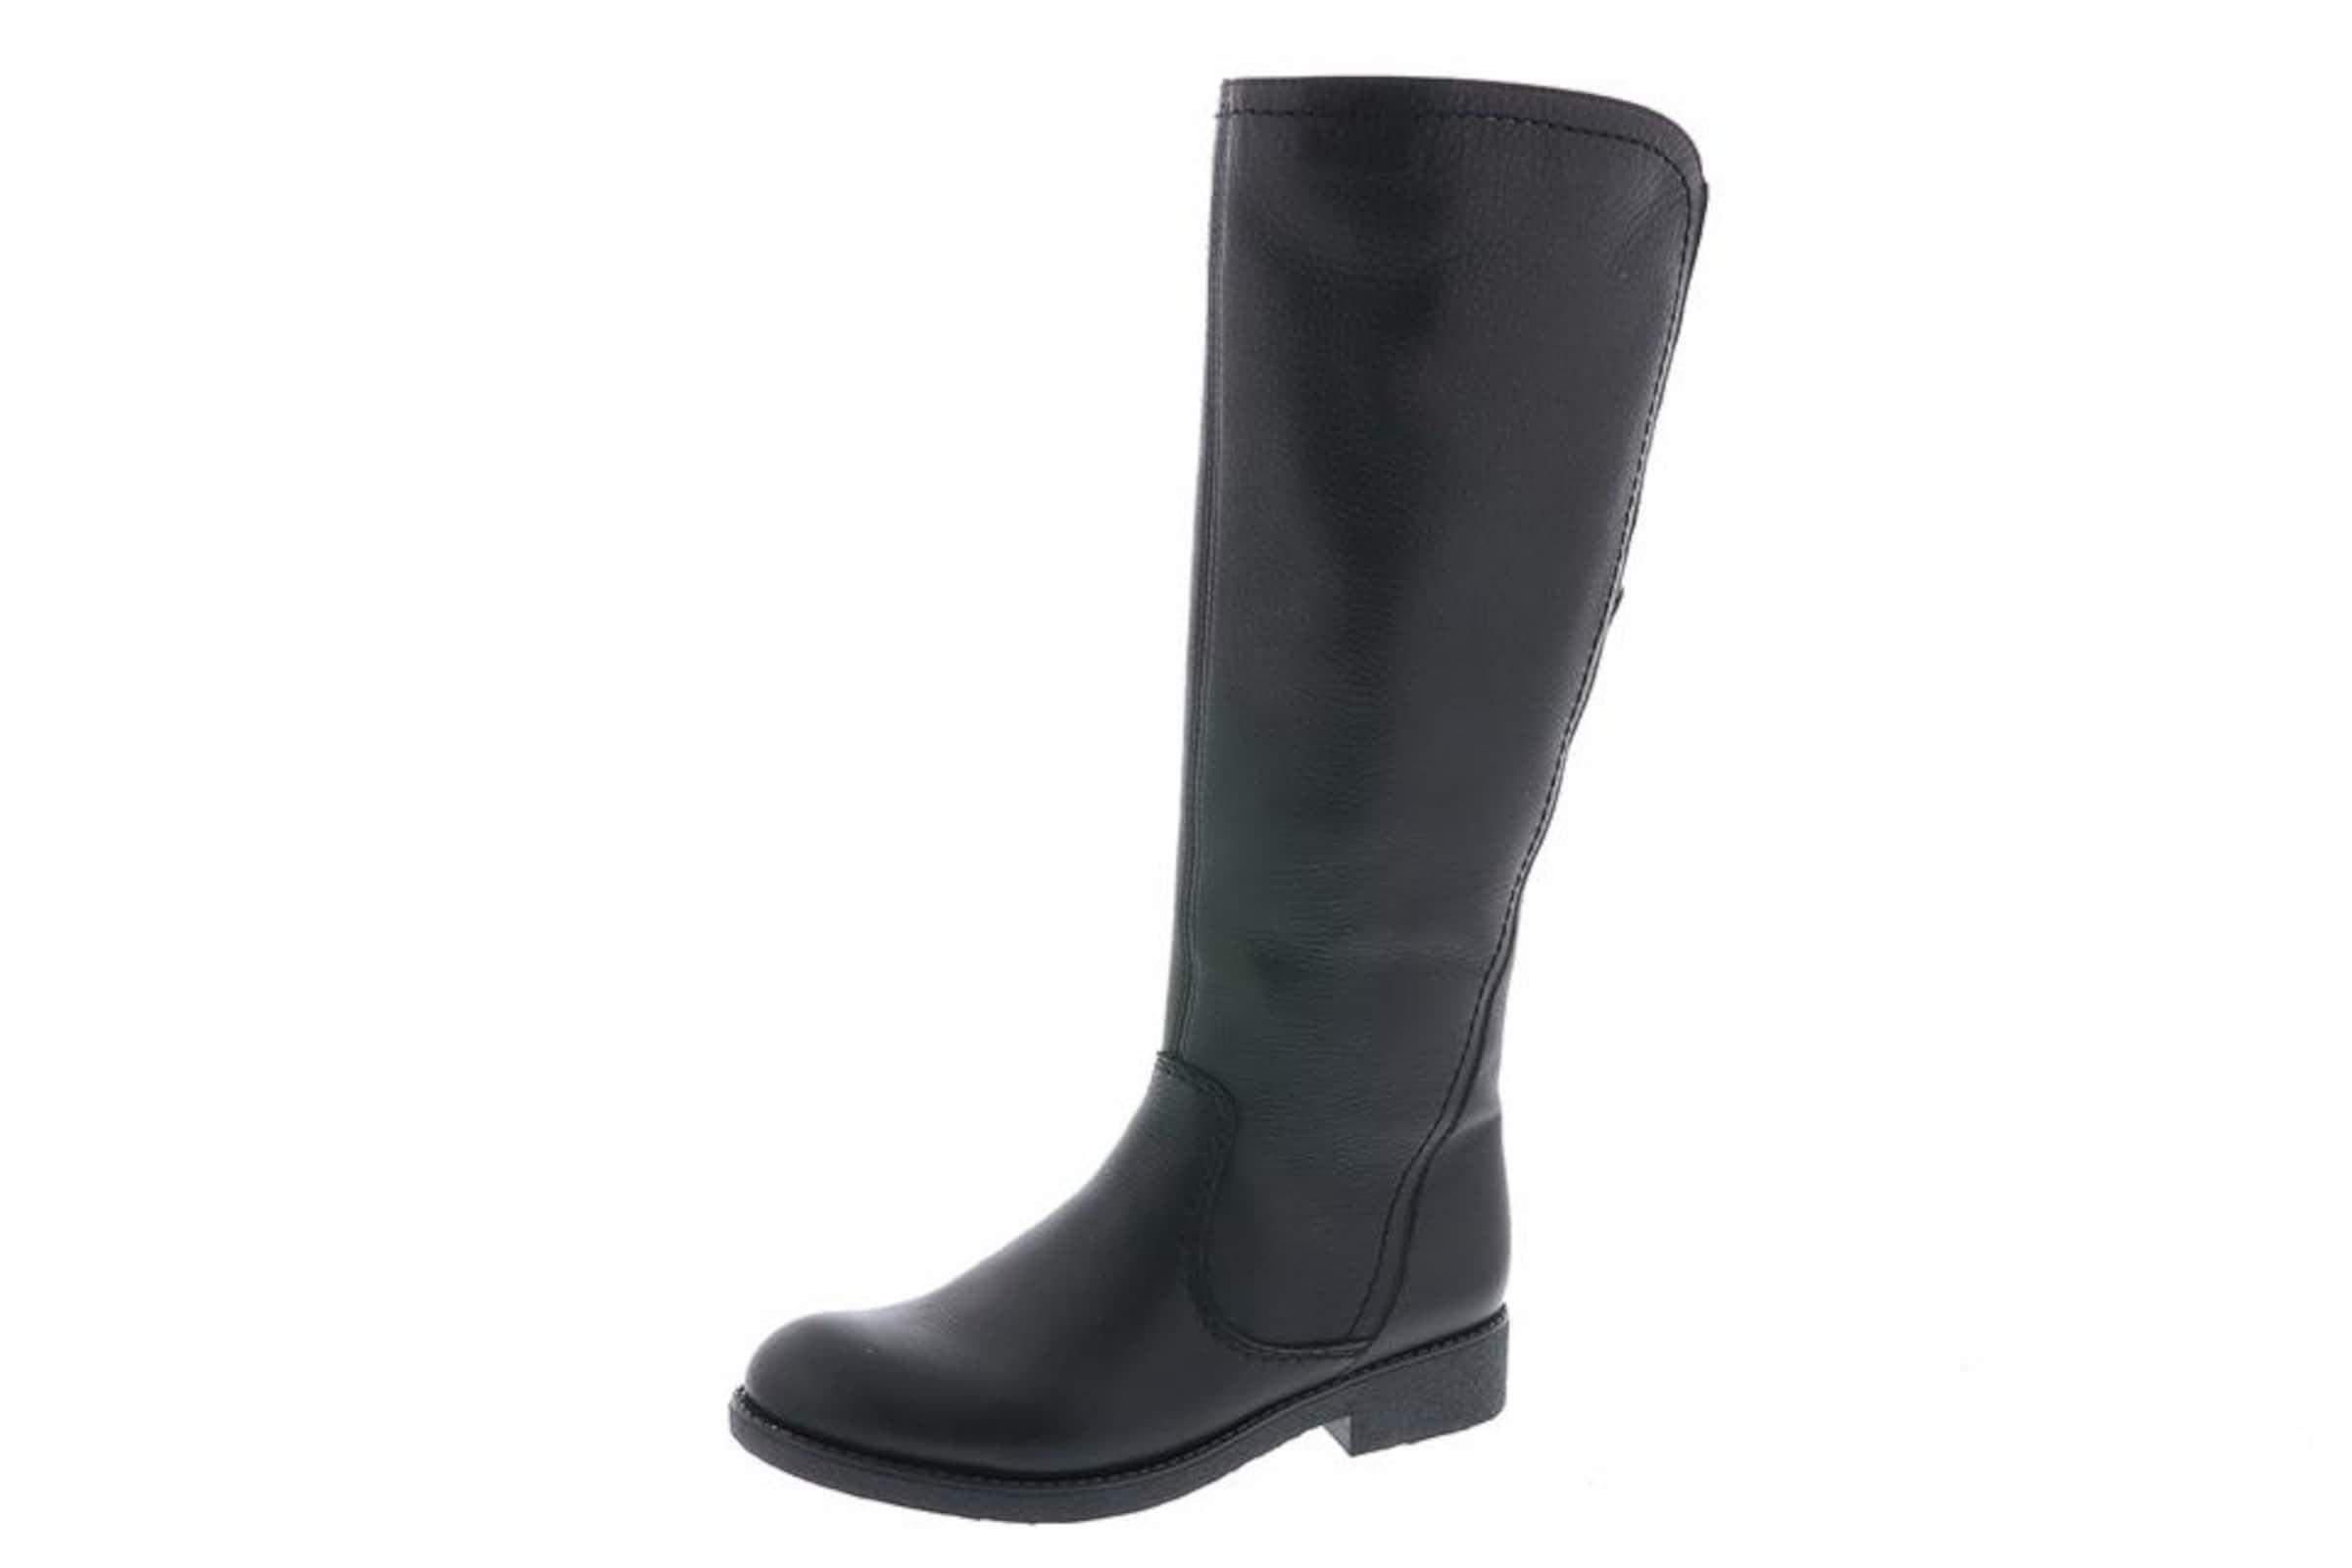 Haltbare Mode billige Schuhe Gut RIEKER | Stiefel Schuhe Gut Schuhe getragene Schuhe 0a1f99